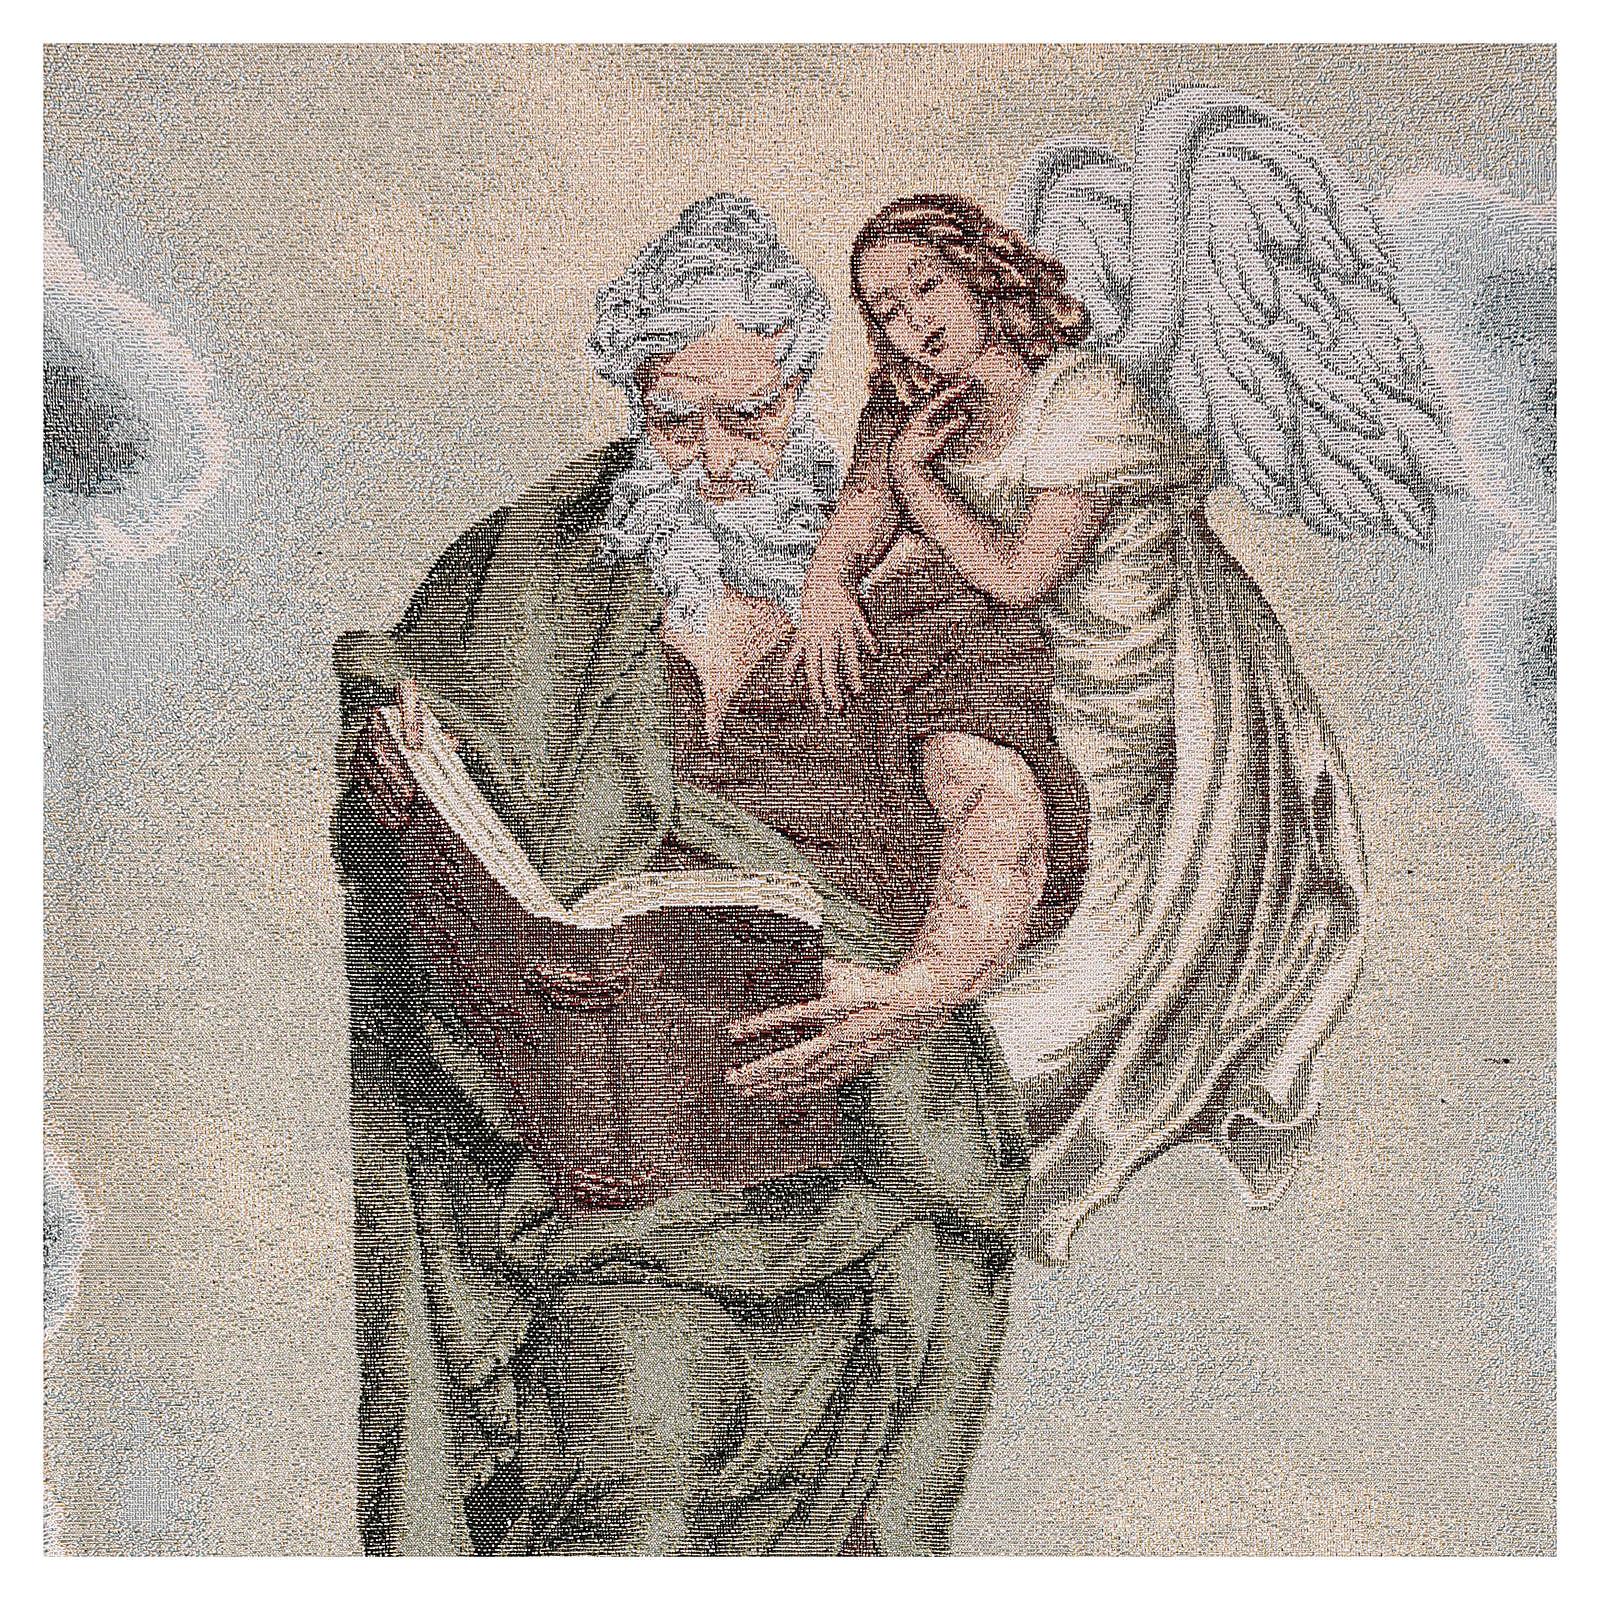 Coprileggio San Matteo Evangelista con angelo avorio 4